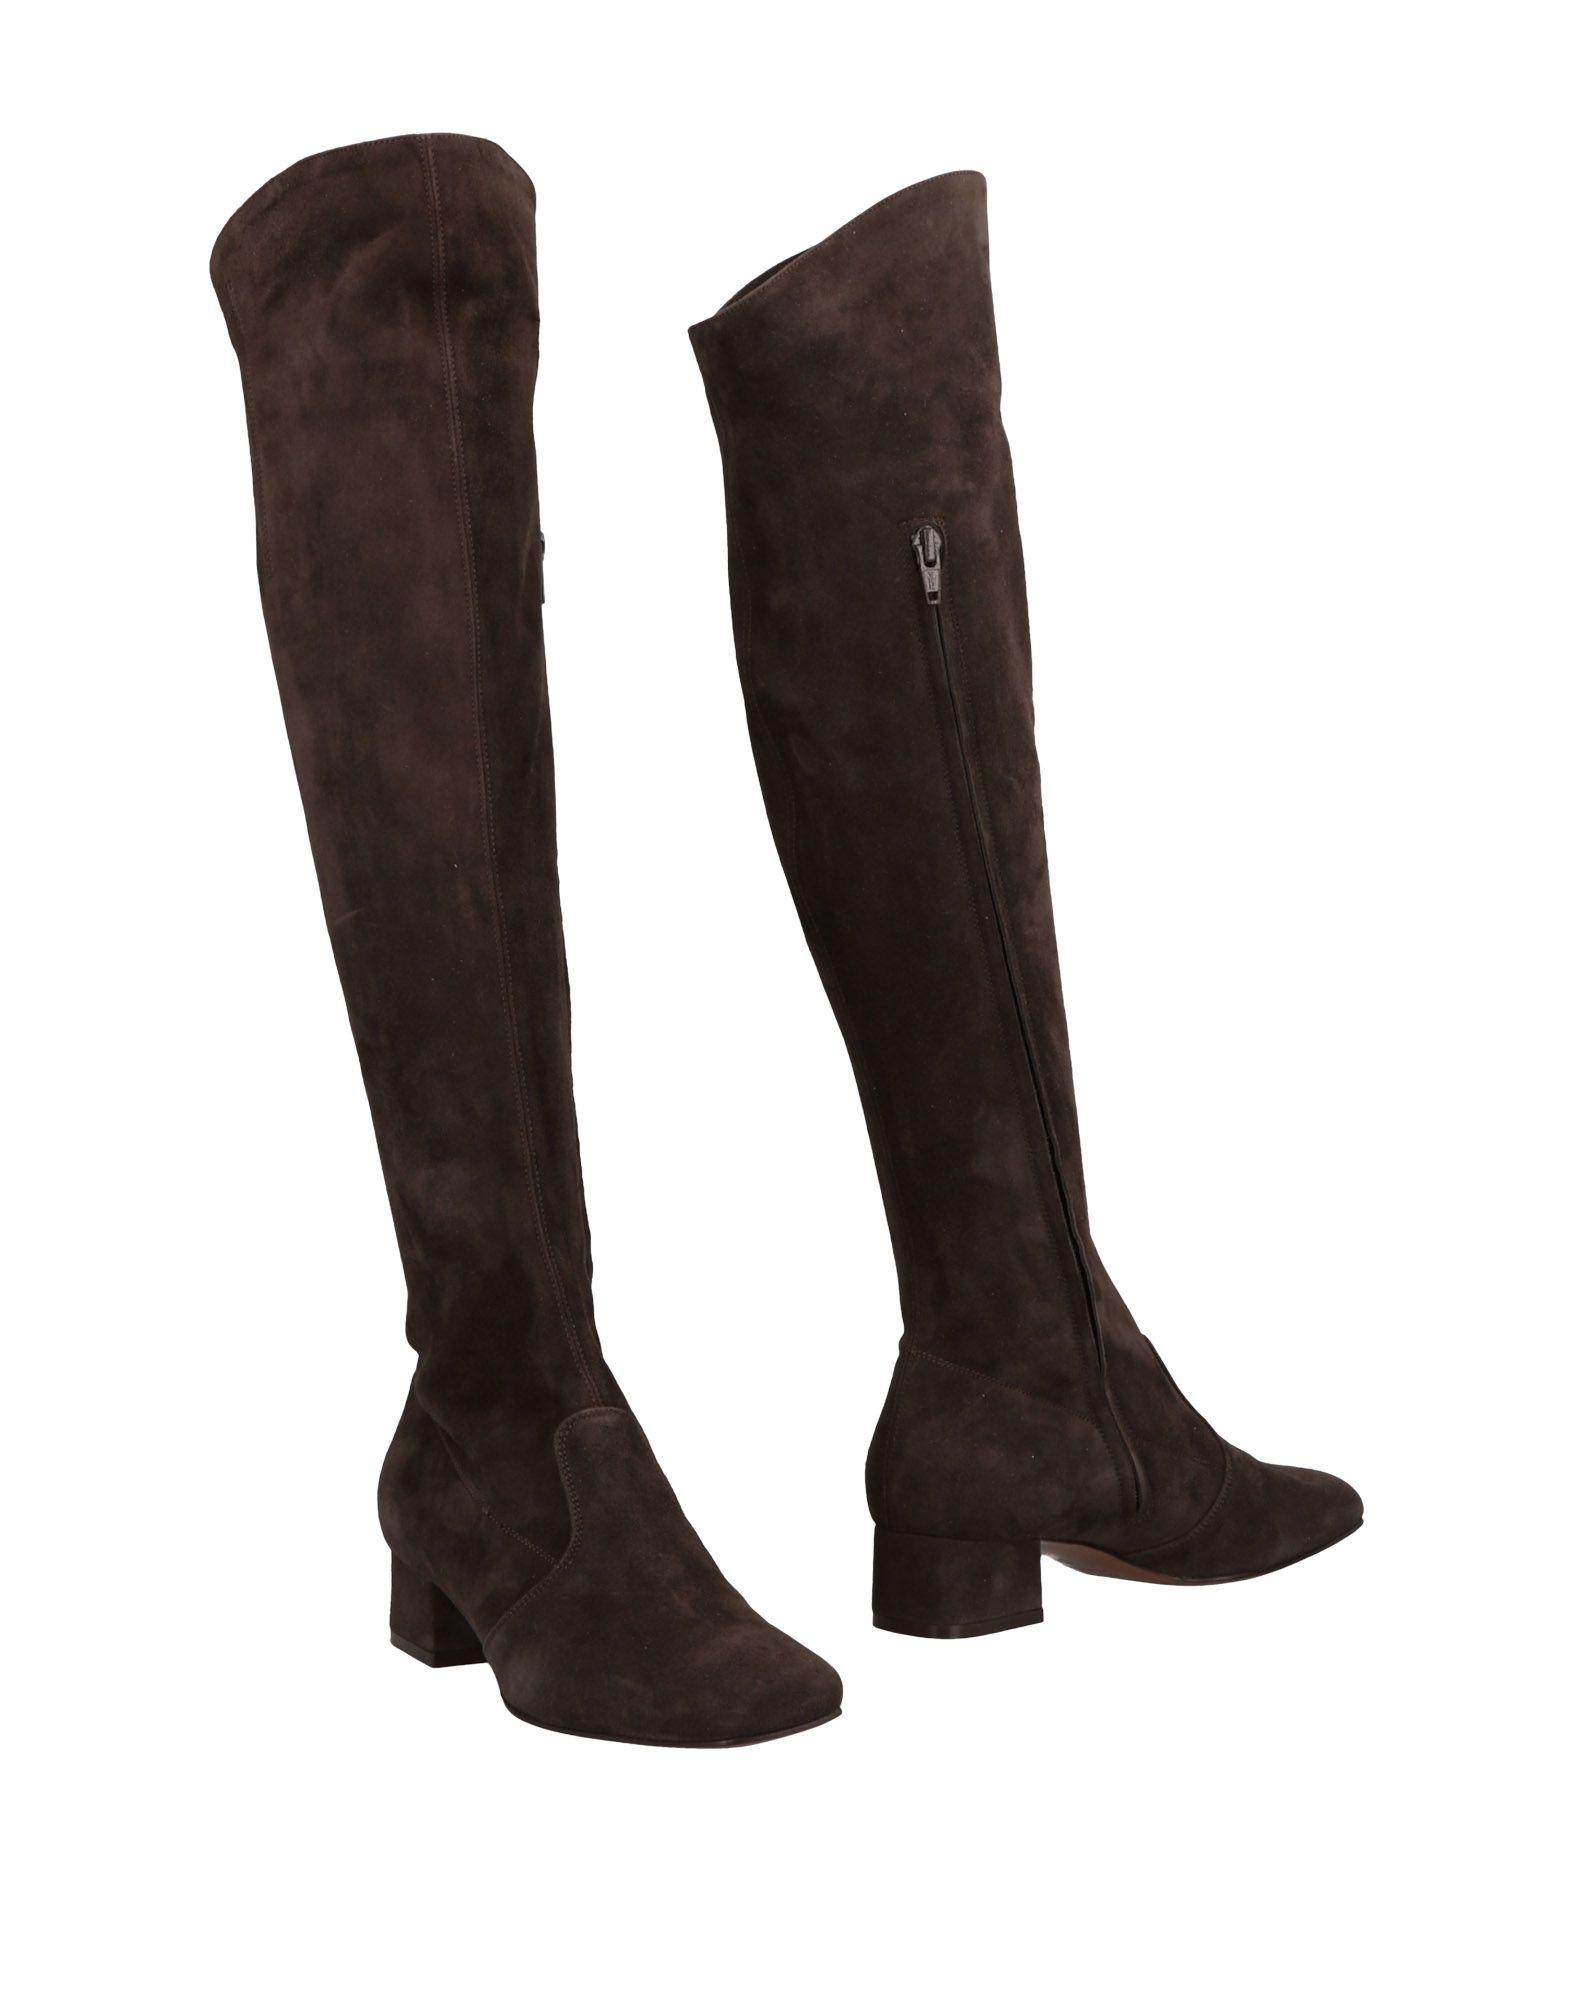 Rabatt Schuhe L' Autre Chose Stiefel Damen  11258152TL